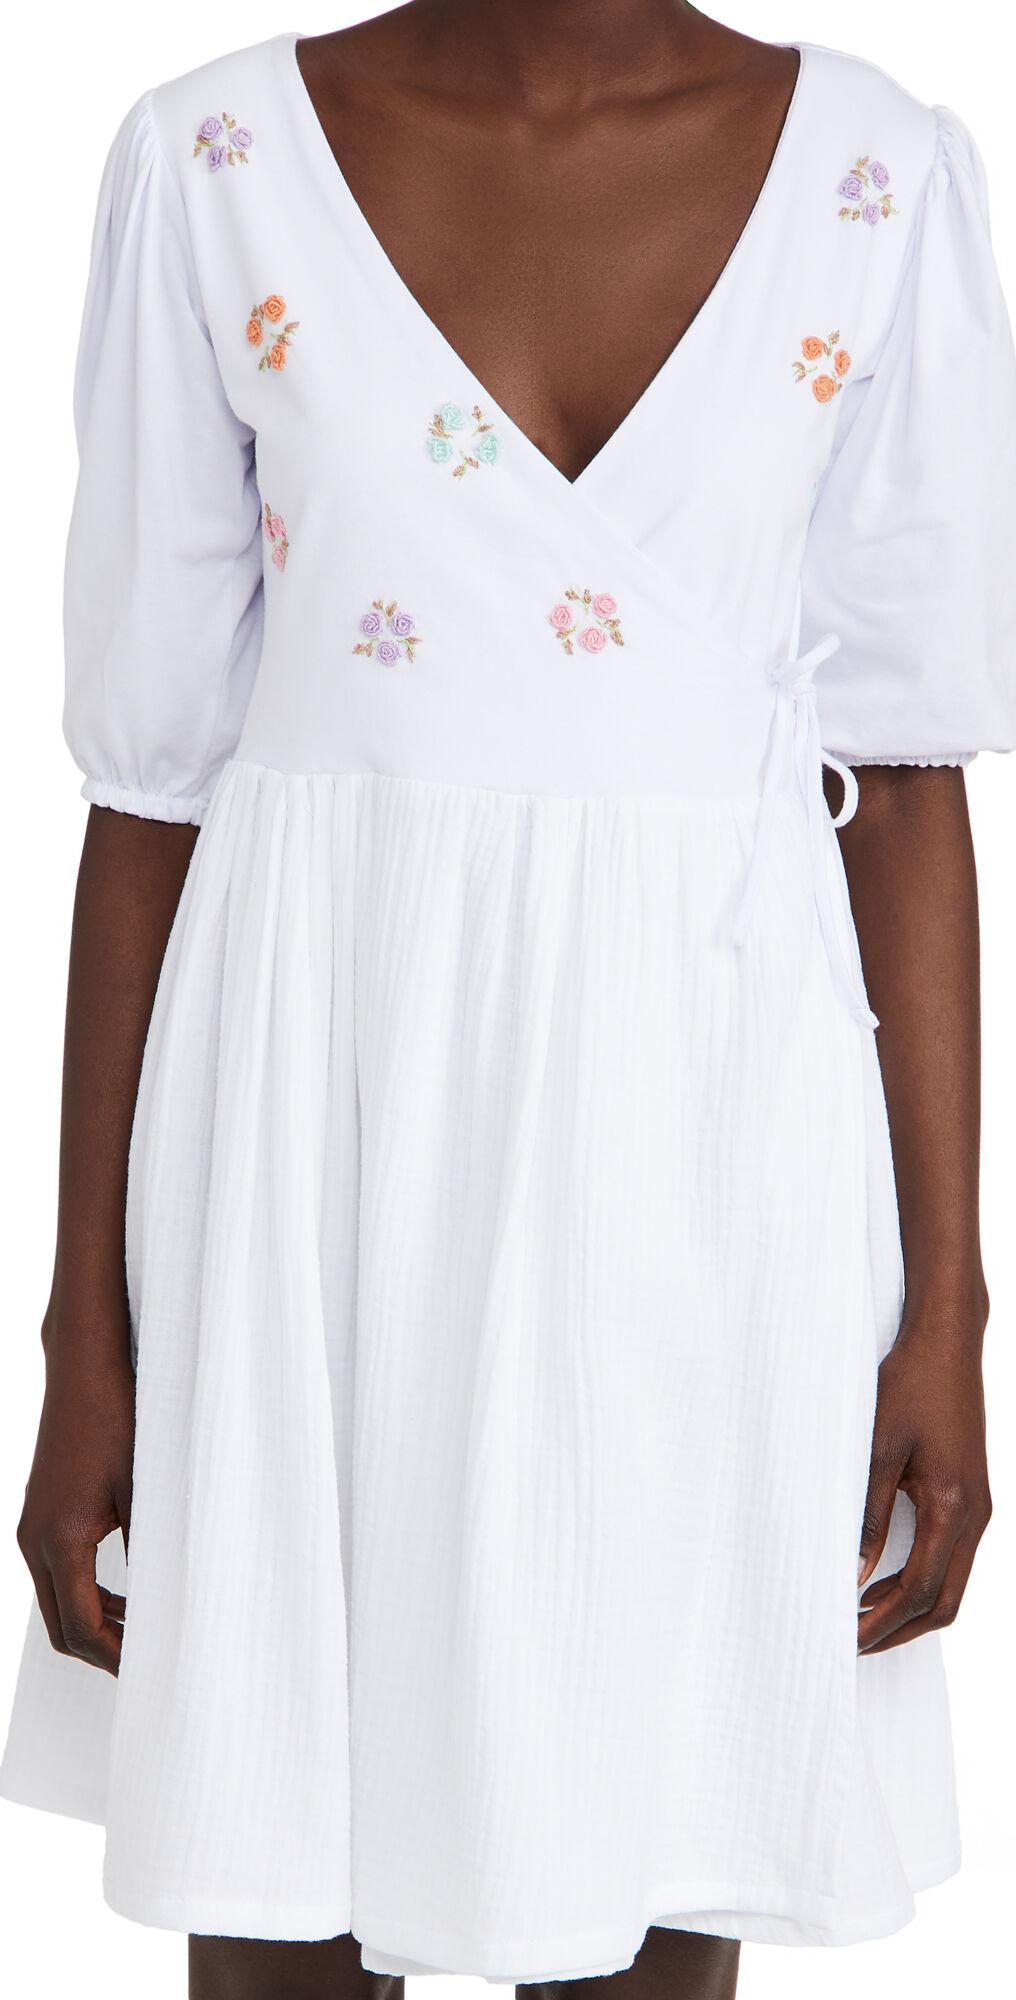 Tach Clothing Felicitas Wrap Dress  - Size: XS